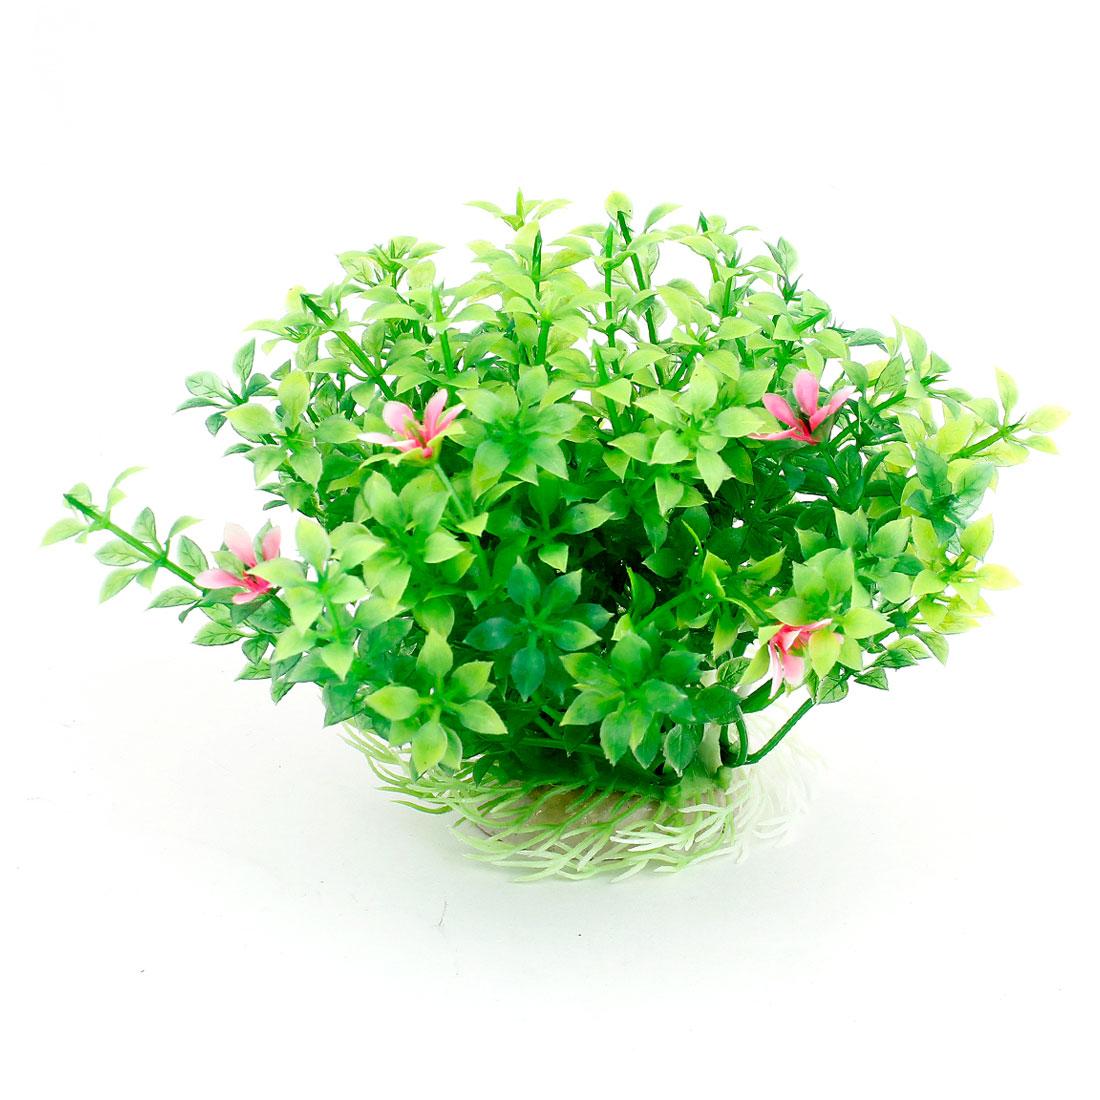 "4.1"" Height Green Artificial Manmade Aquarium Decoration Grass Plant"